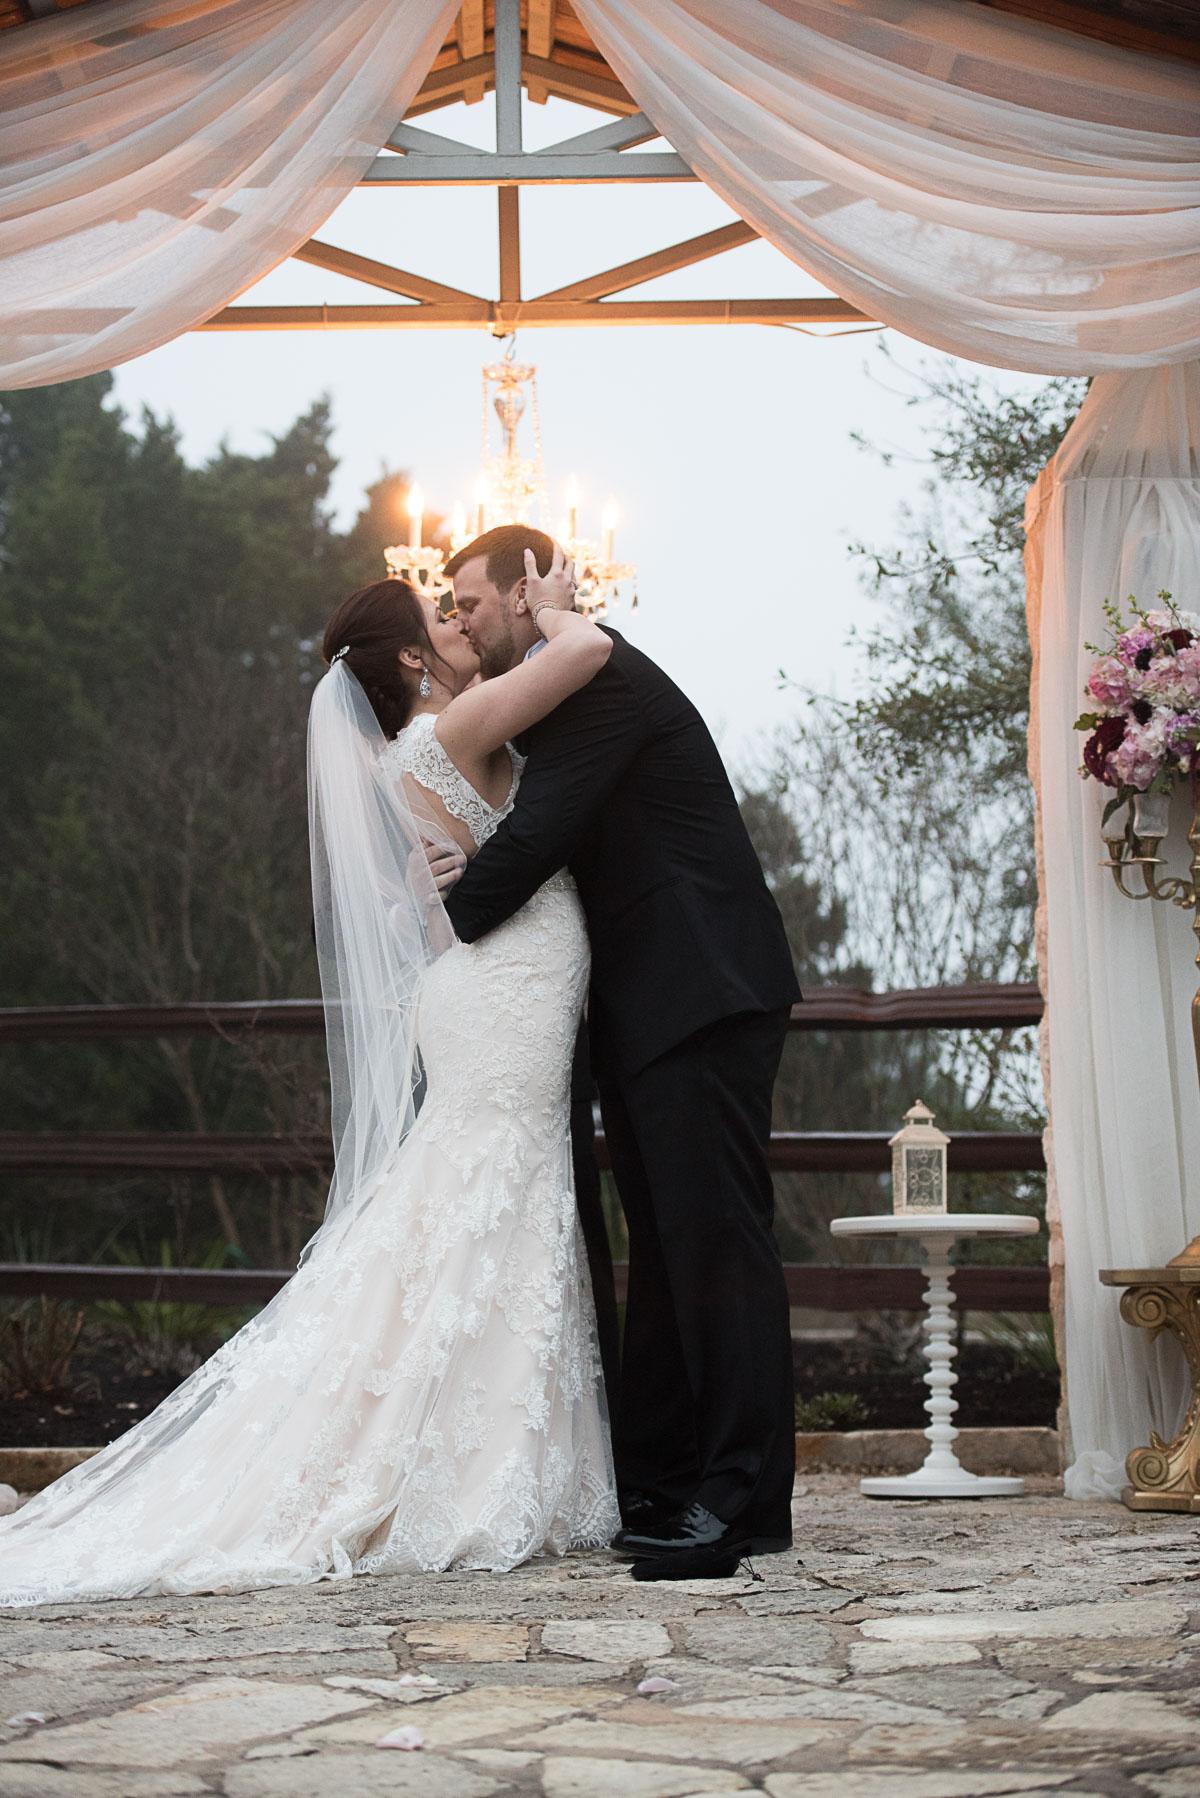 Austin Texas Wedding at the Terrace Club in Drippin Springs Fog in February-102.JPG